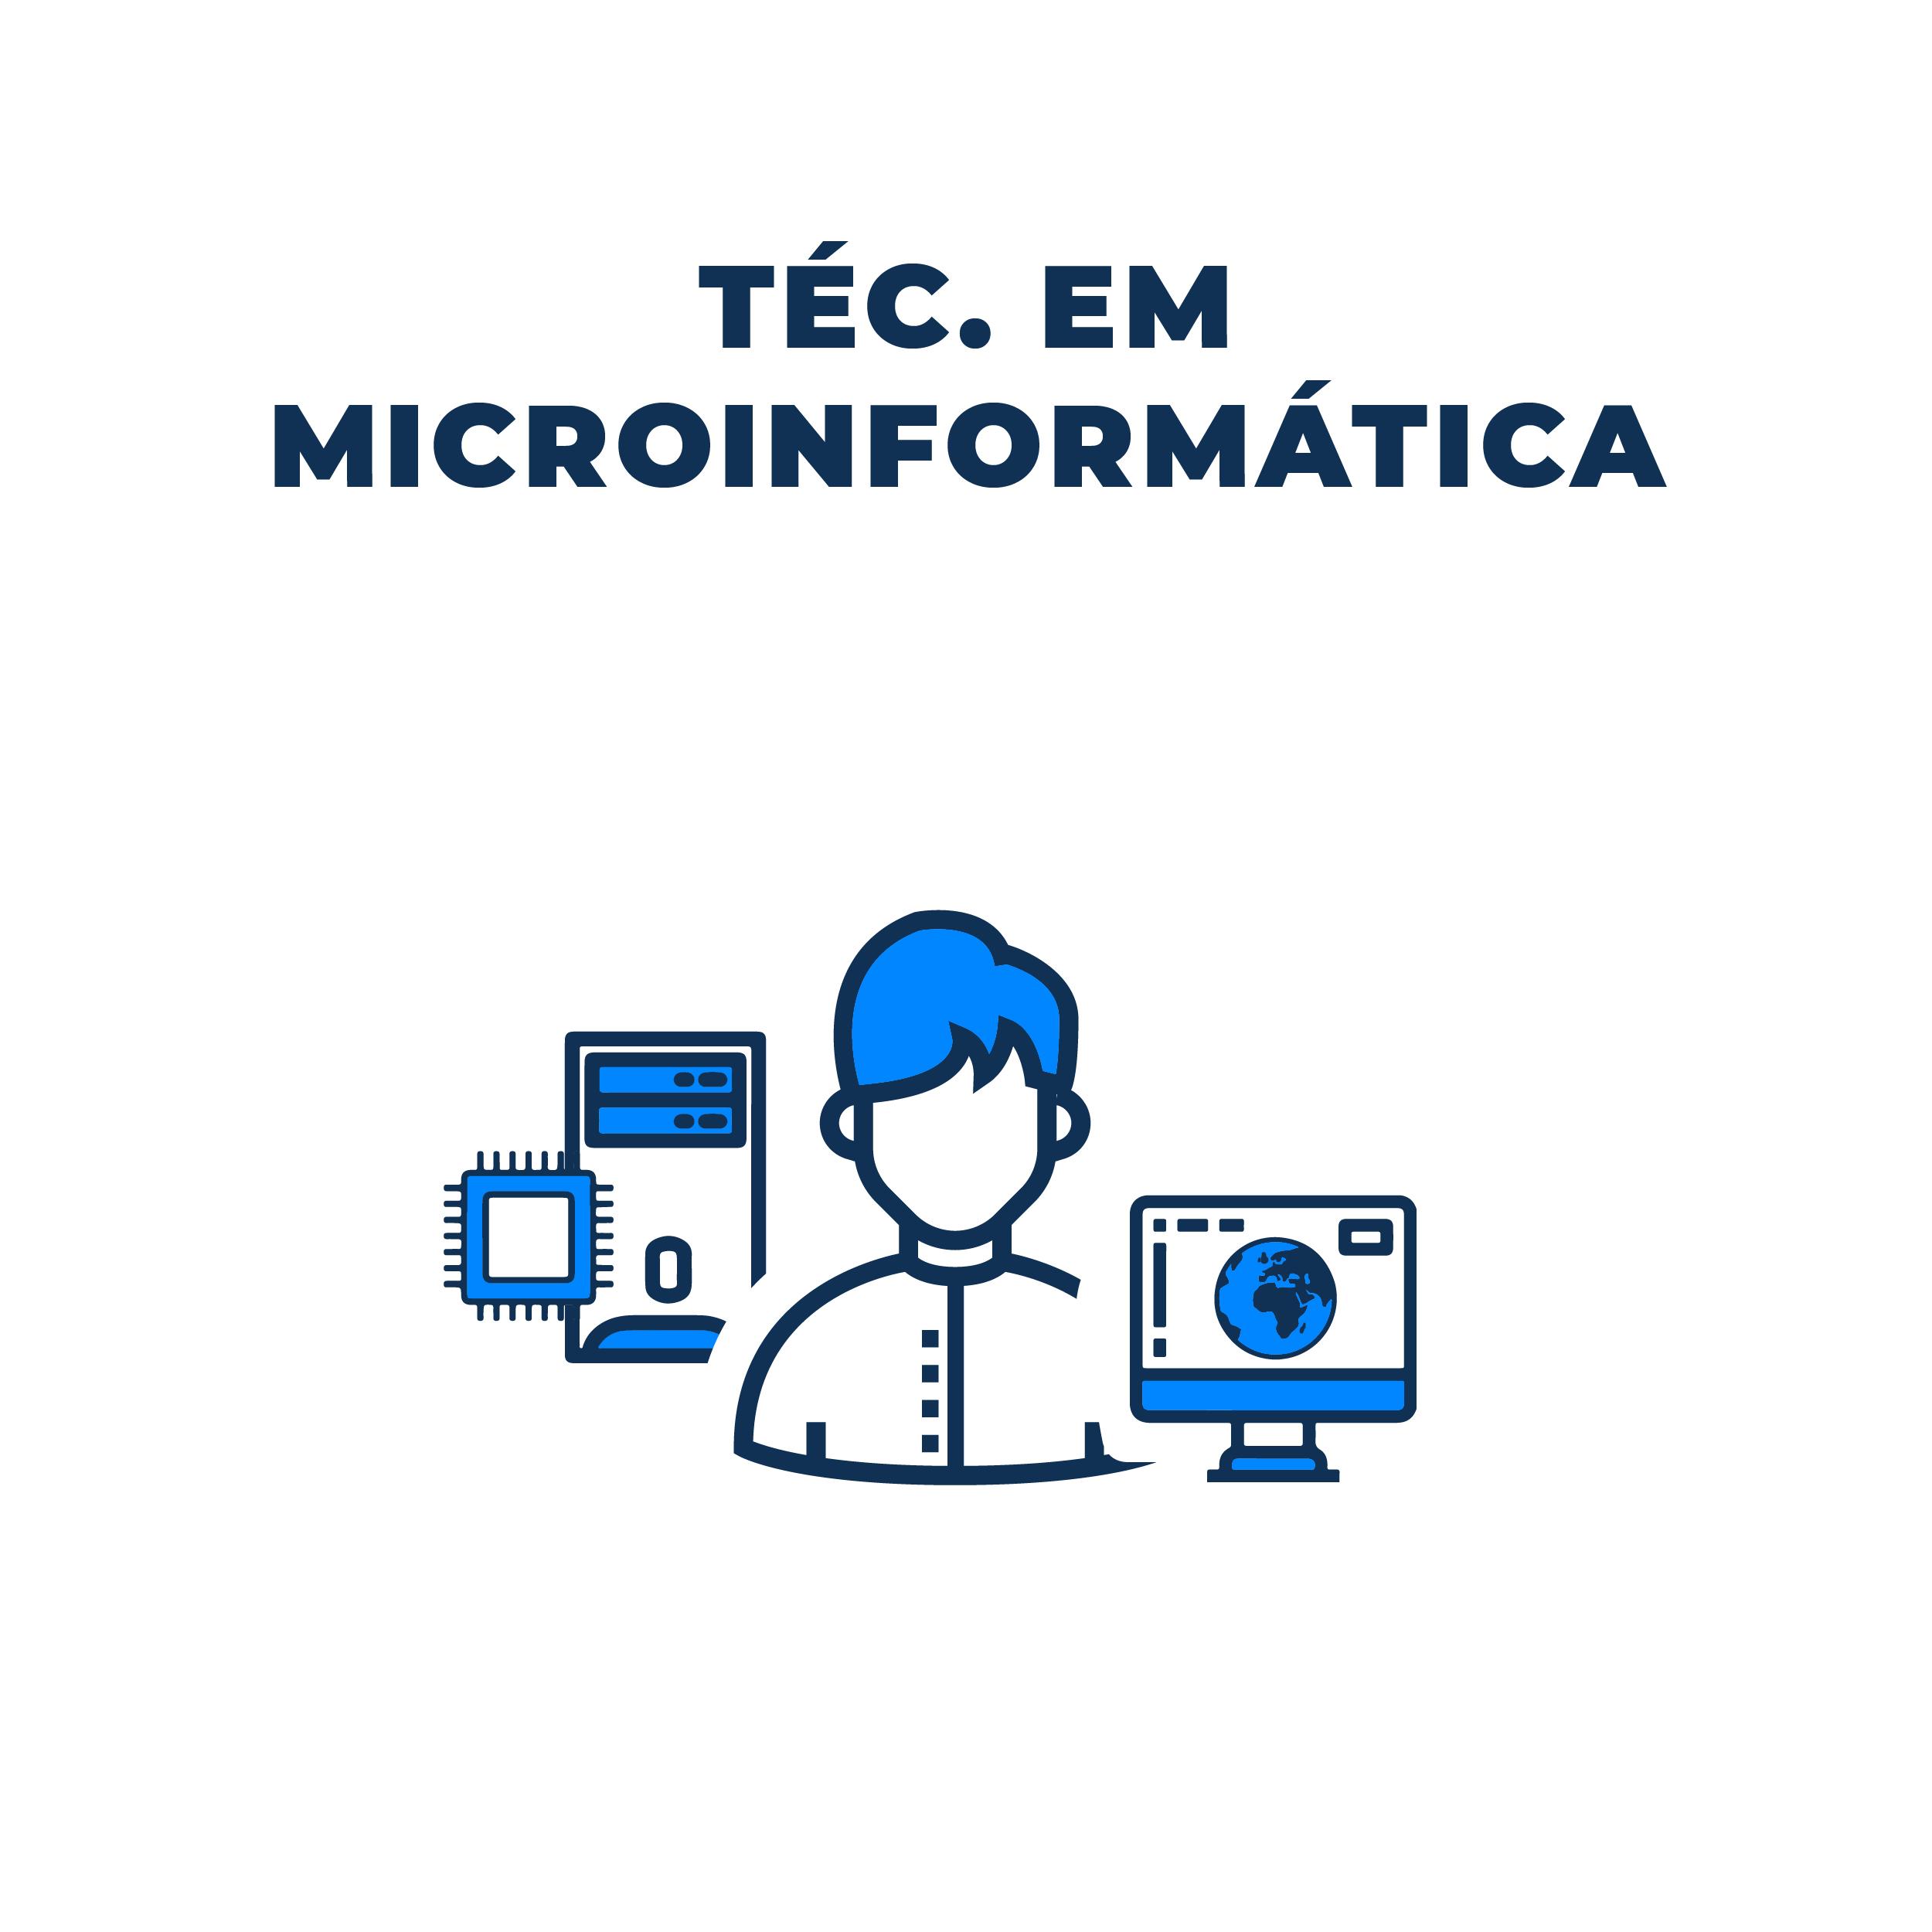 microinformatica